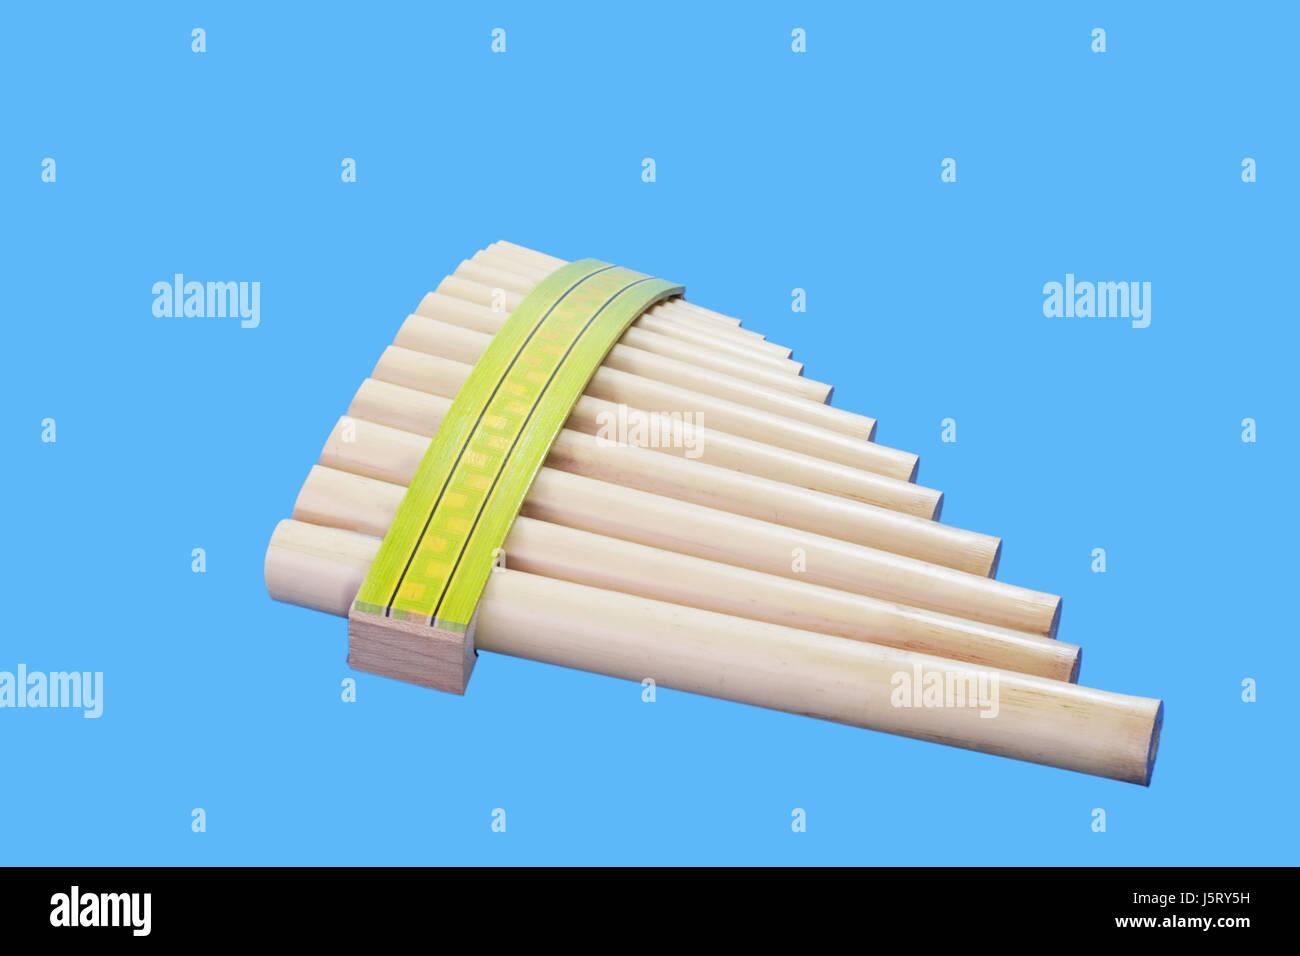 Musikinstrument Bambus Querflote Holzblaser Massnahme Instrument